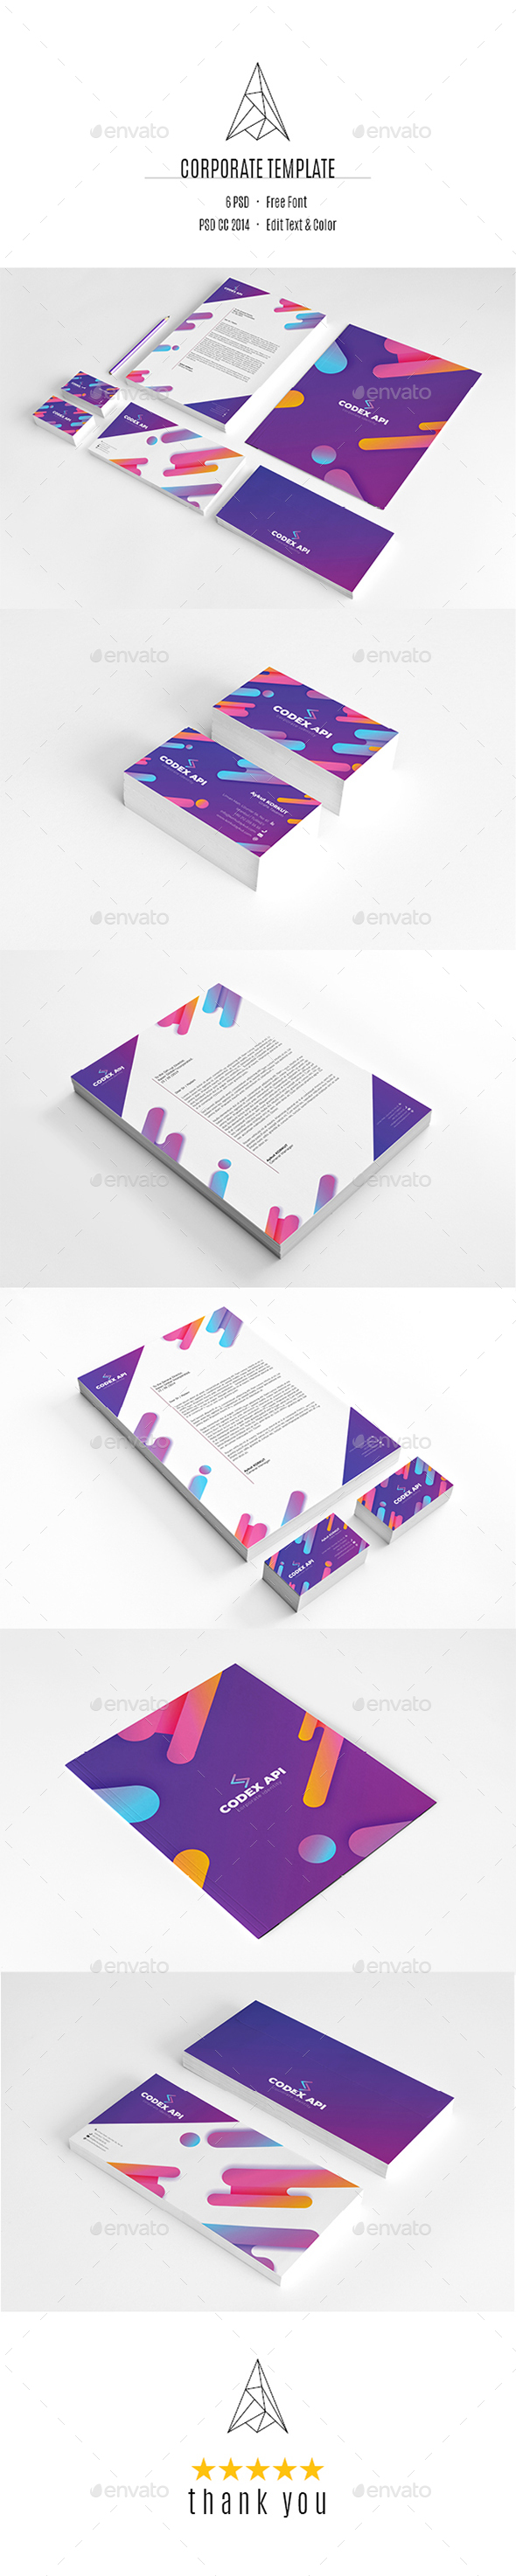 Codex Api Corporate Identity - Stationery Print Templates